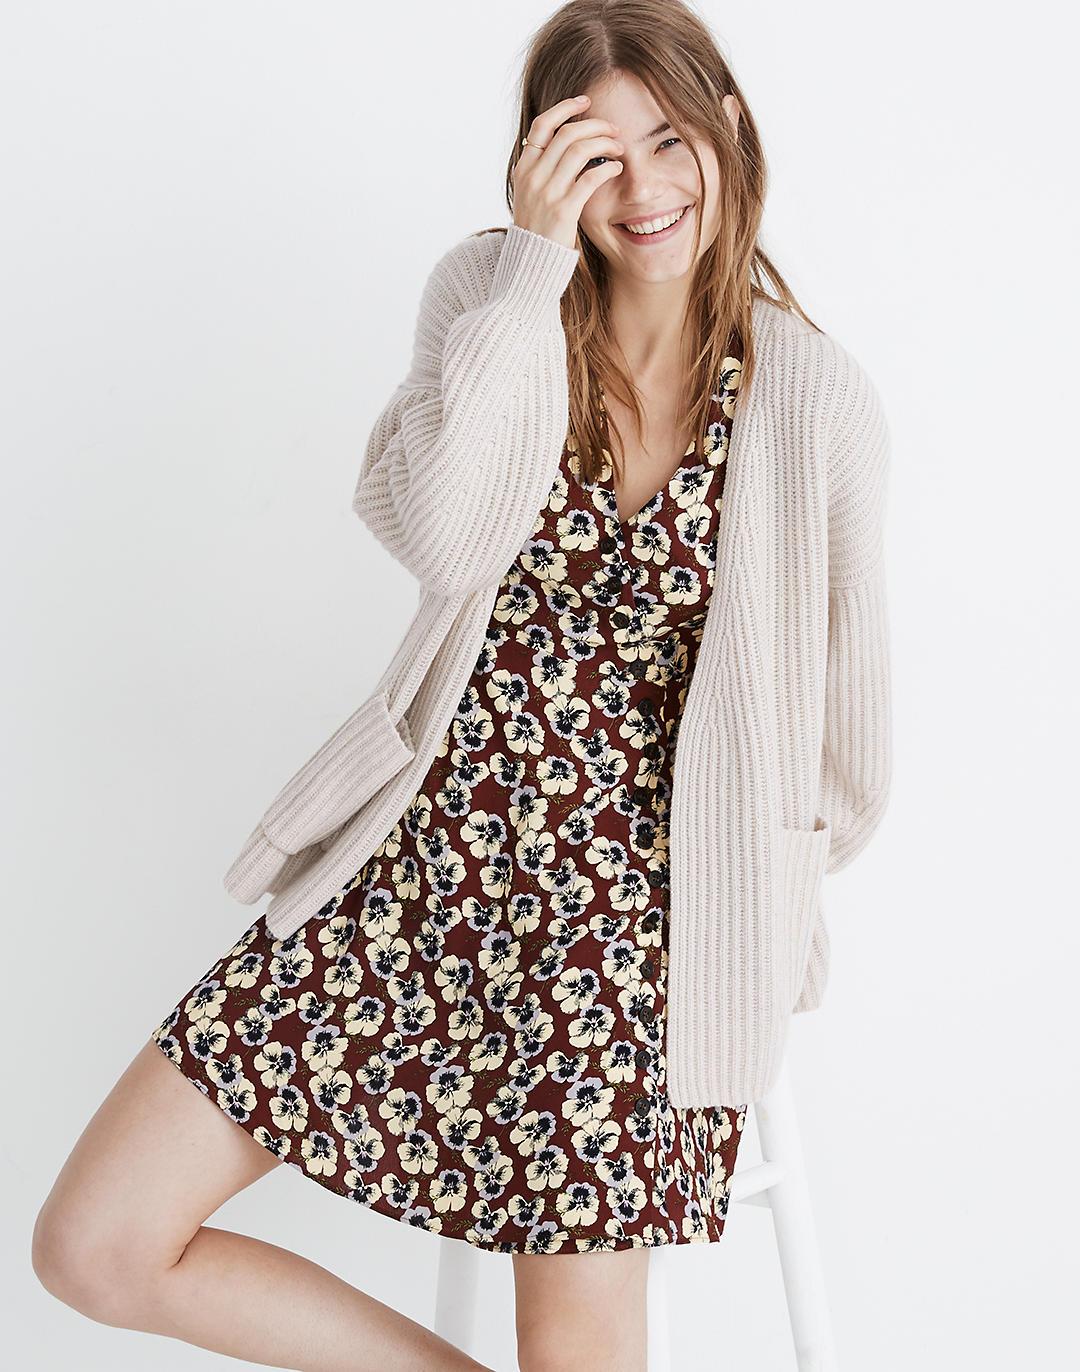 Madewell Redford Cardigan Sweater